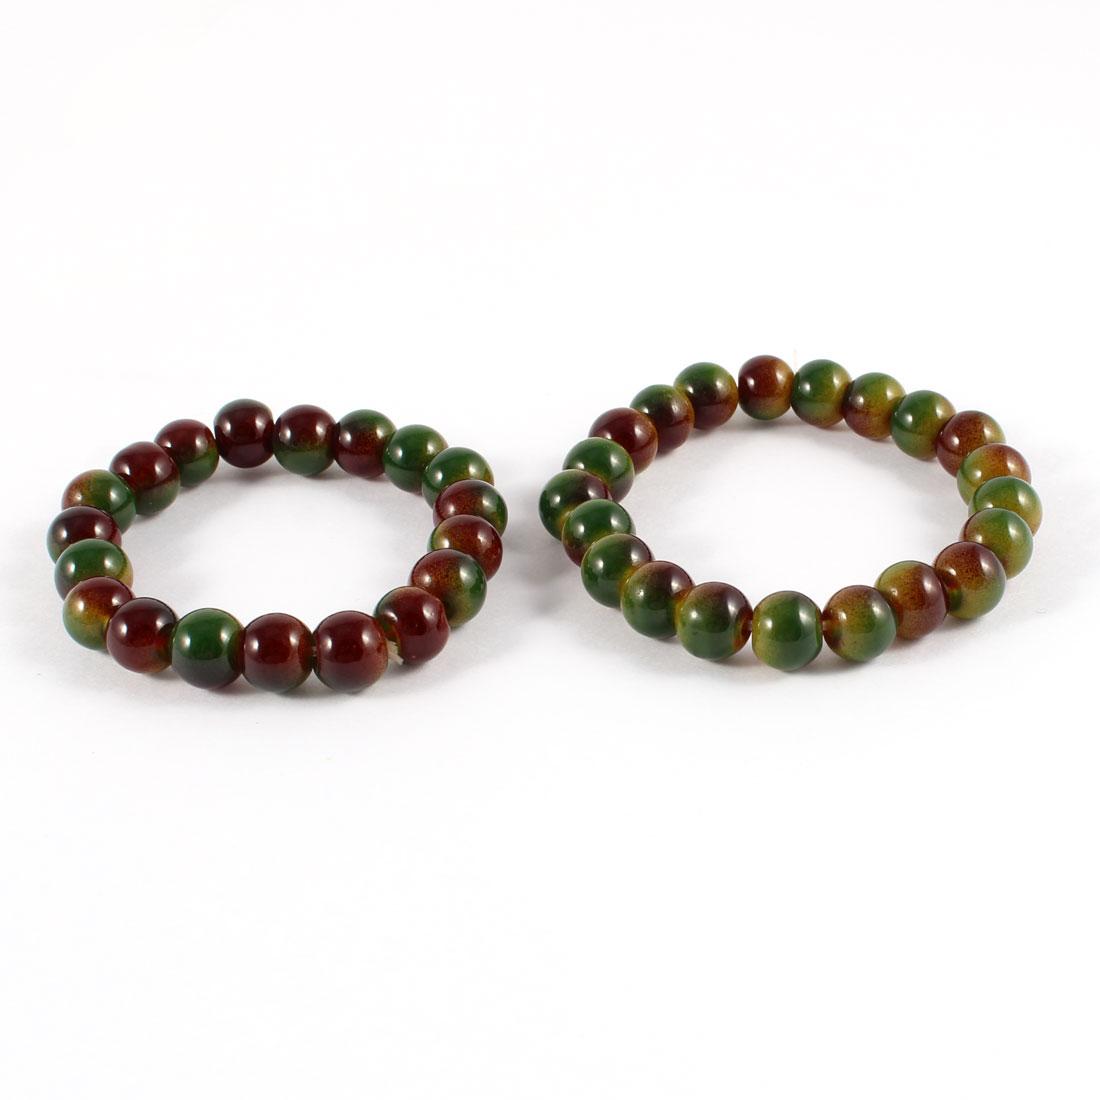 2 Pcs Flexible Plastic Bead Decor Wrist Band Bracelet Bangle Green Brown